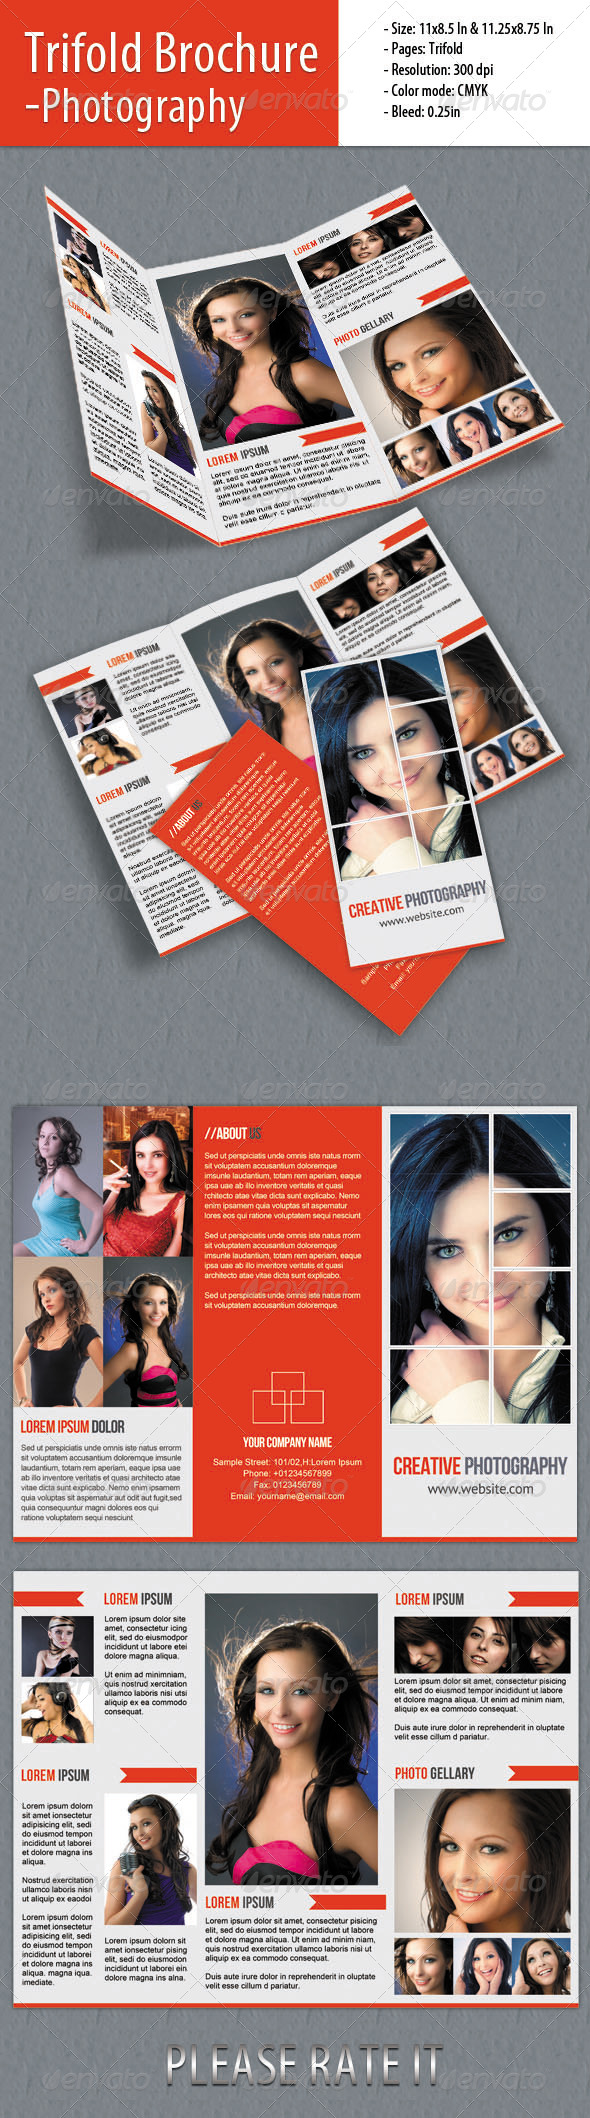 Trifold Brochure -Photography - Portfolio Brochures